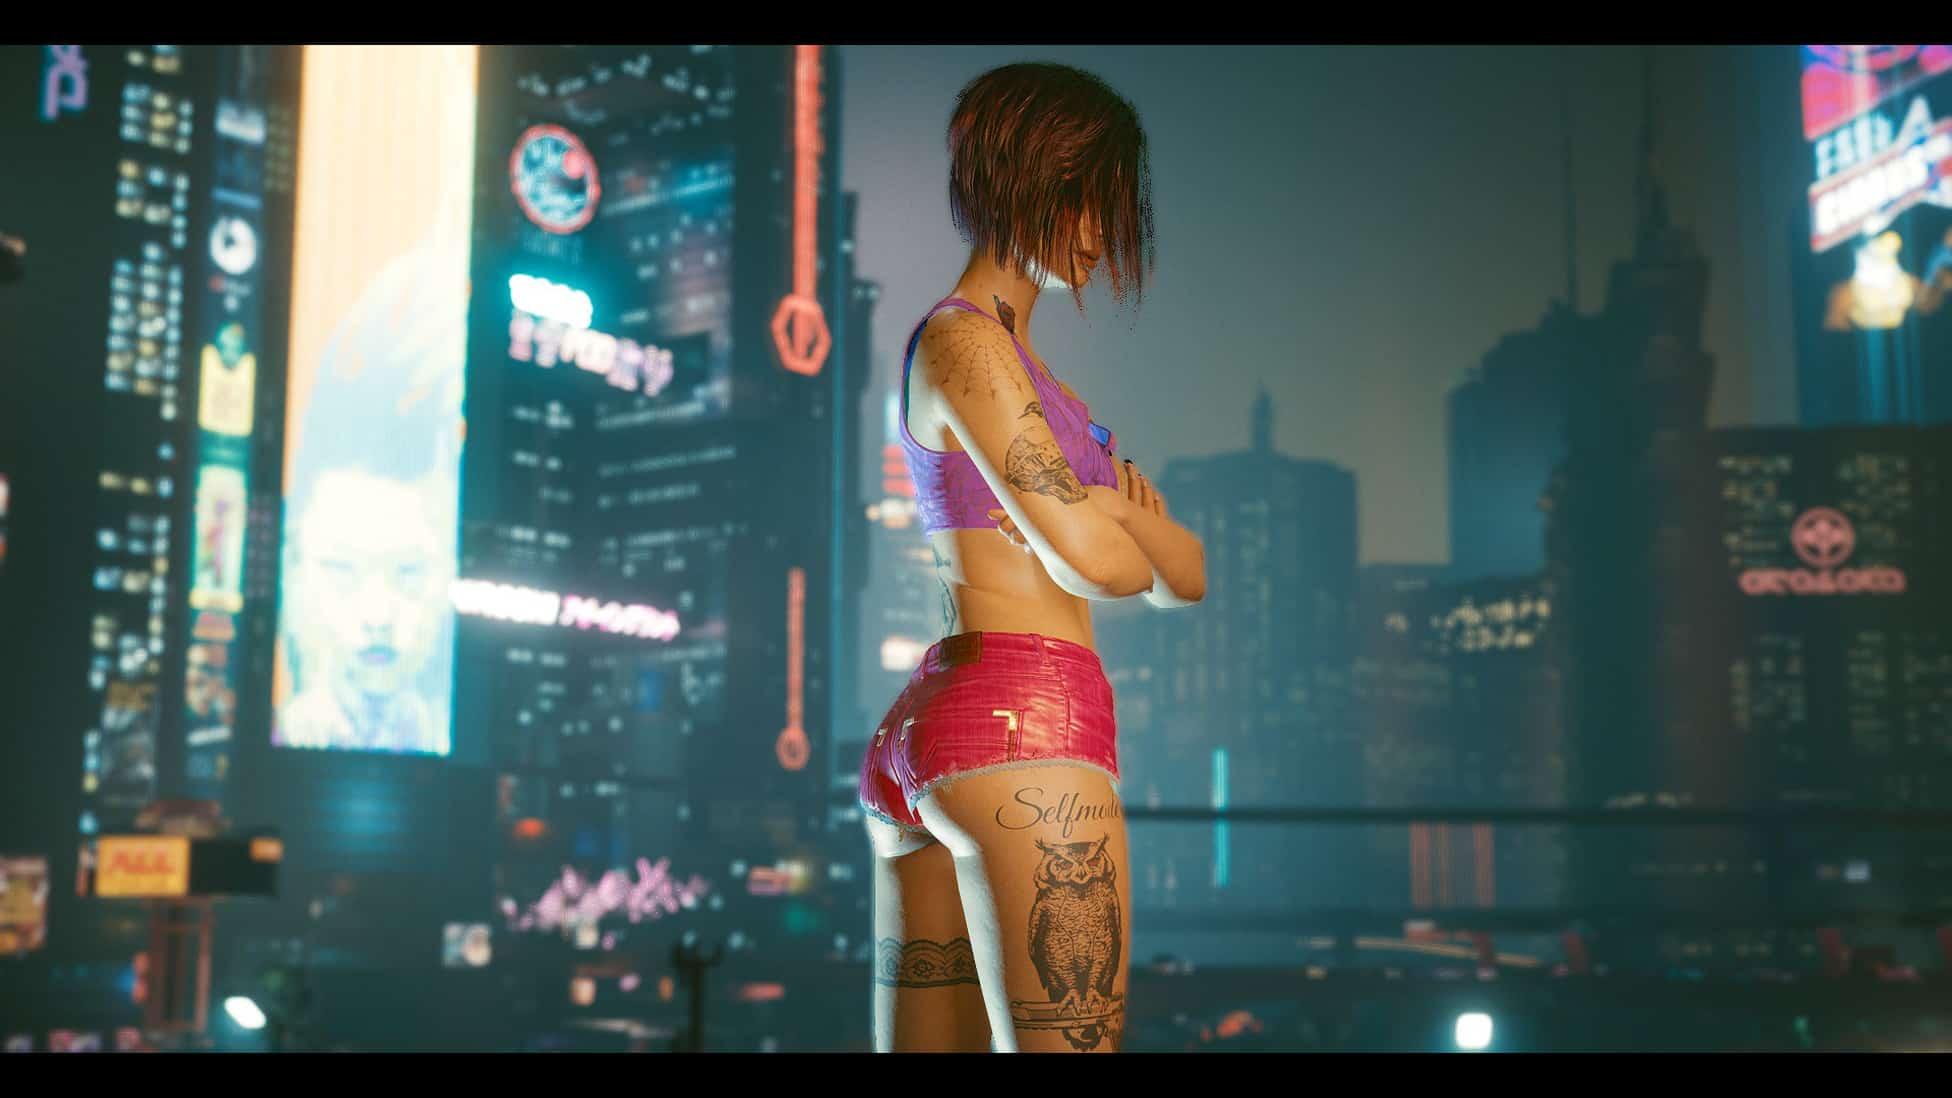 Judy V (Tattoos - face - preset) By Alostraz - Cyberpunk